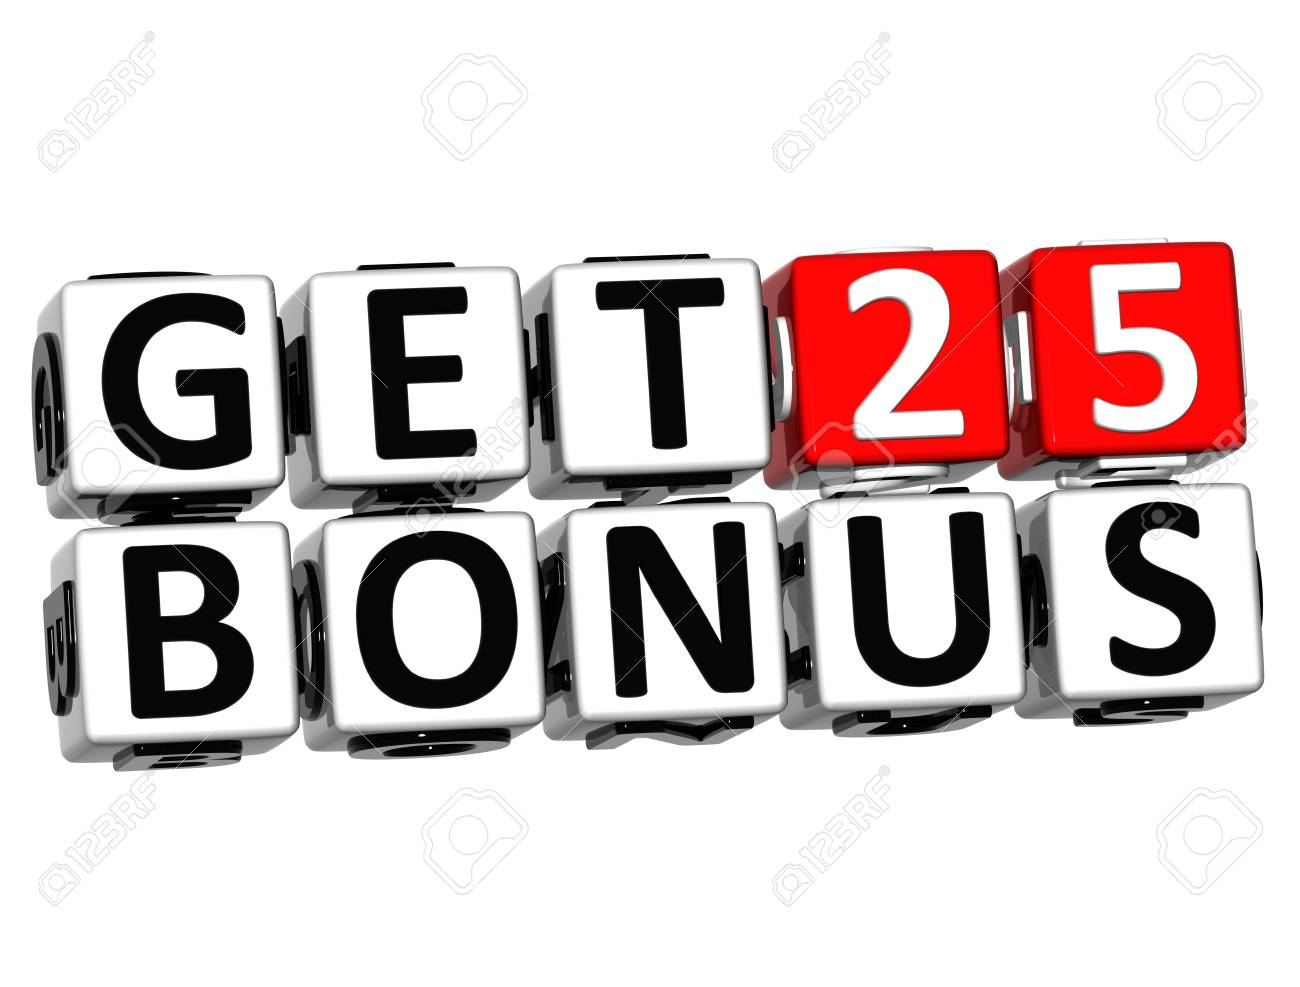 3D Get 25 Bonus Credits Block Letters over white background